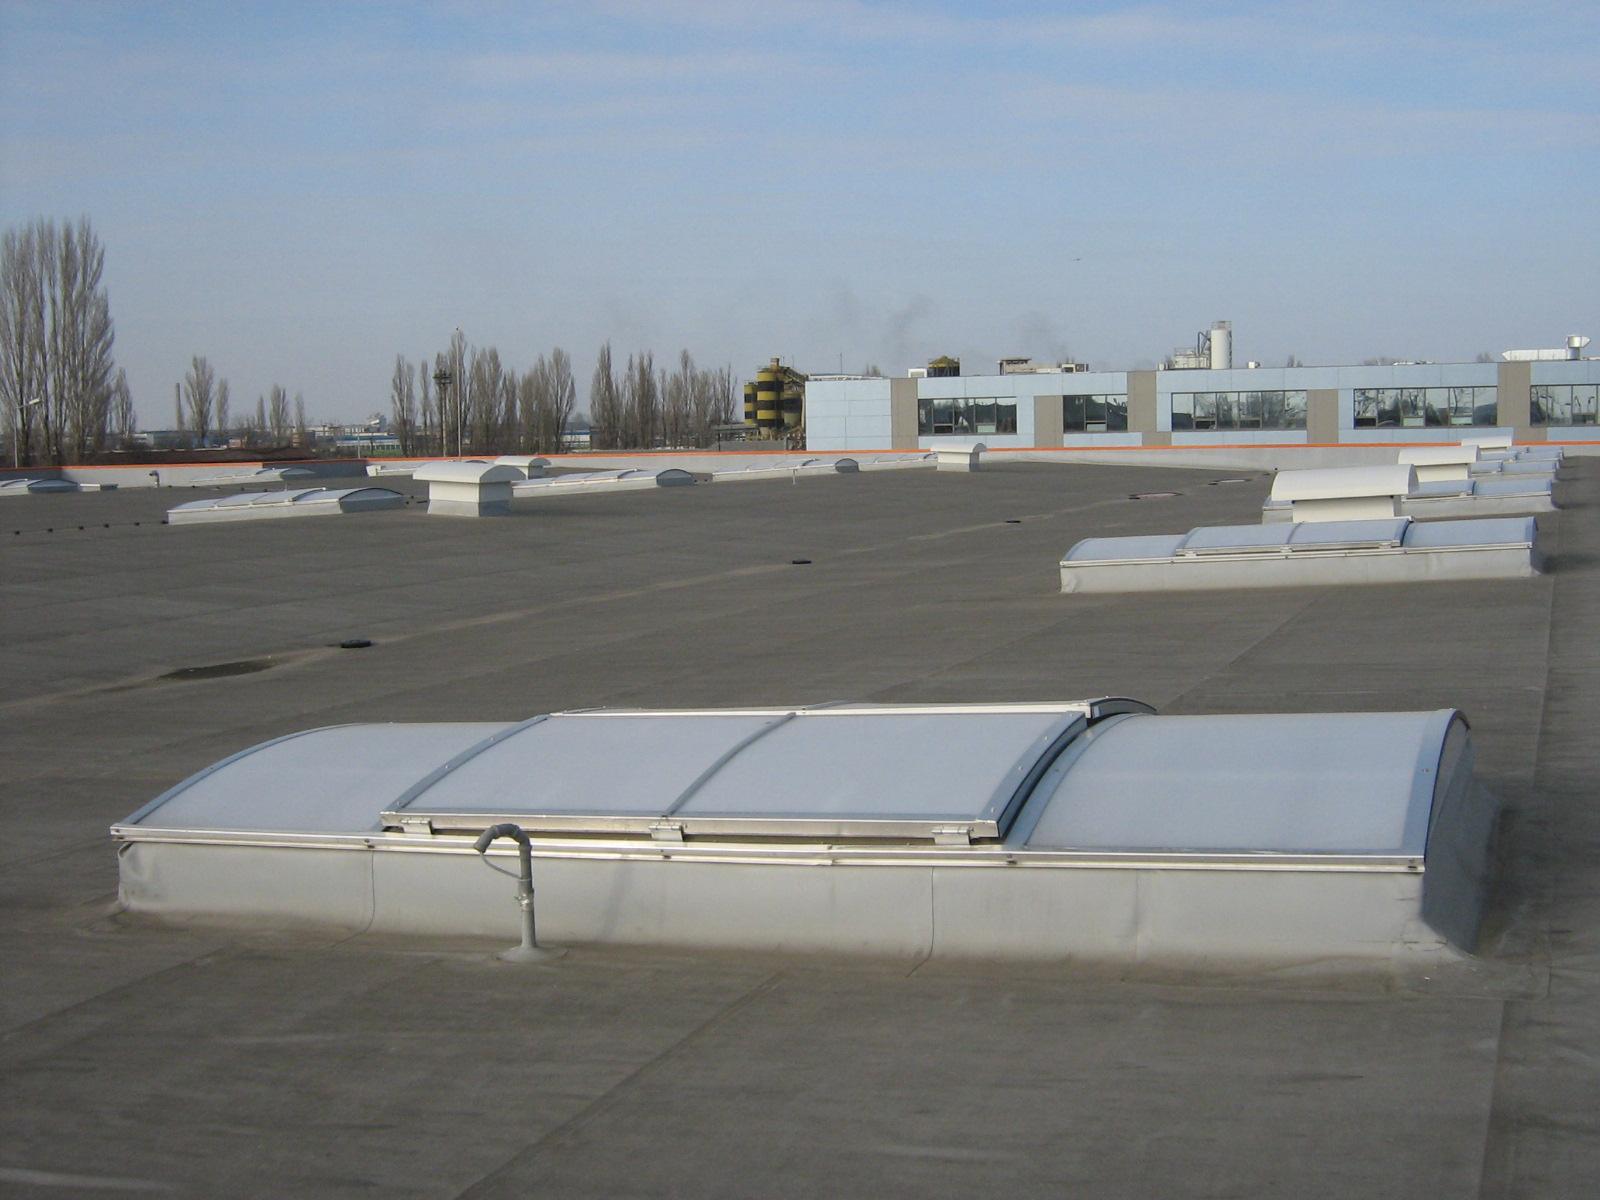 Luminatoare industriale - Spatiu comercial OBI - Policolor HEXADOME - Poza 3